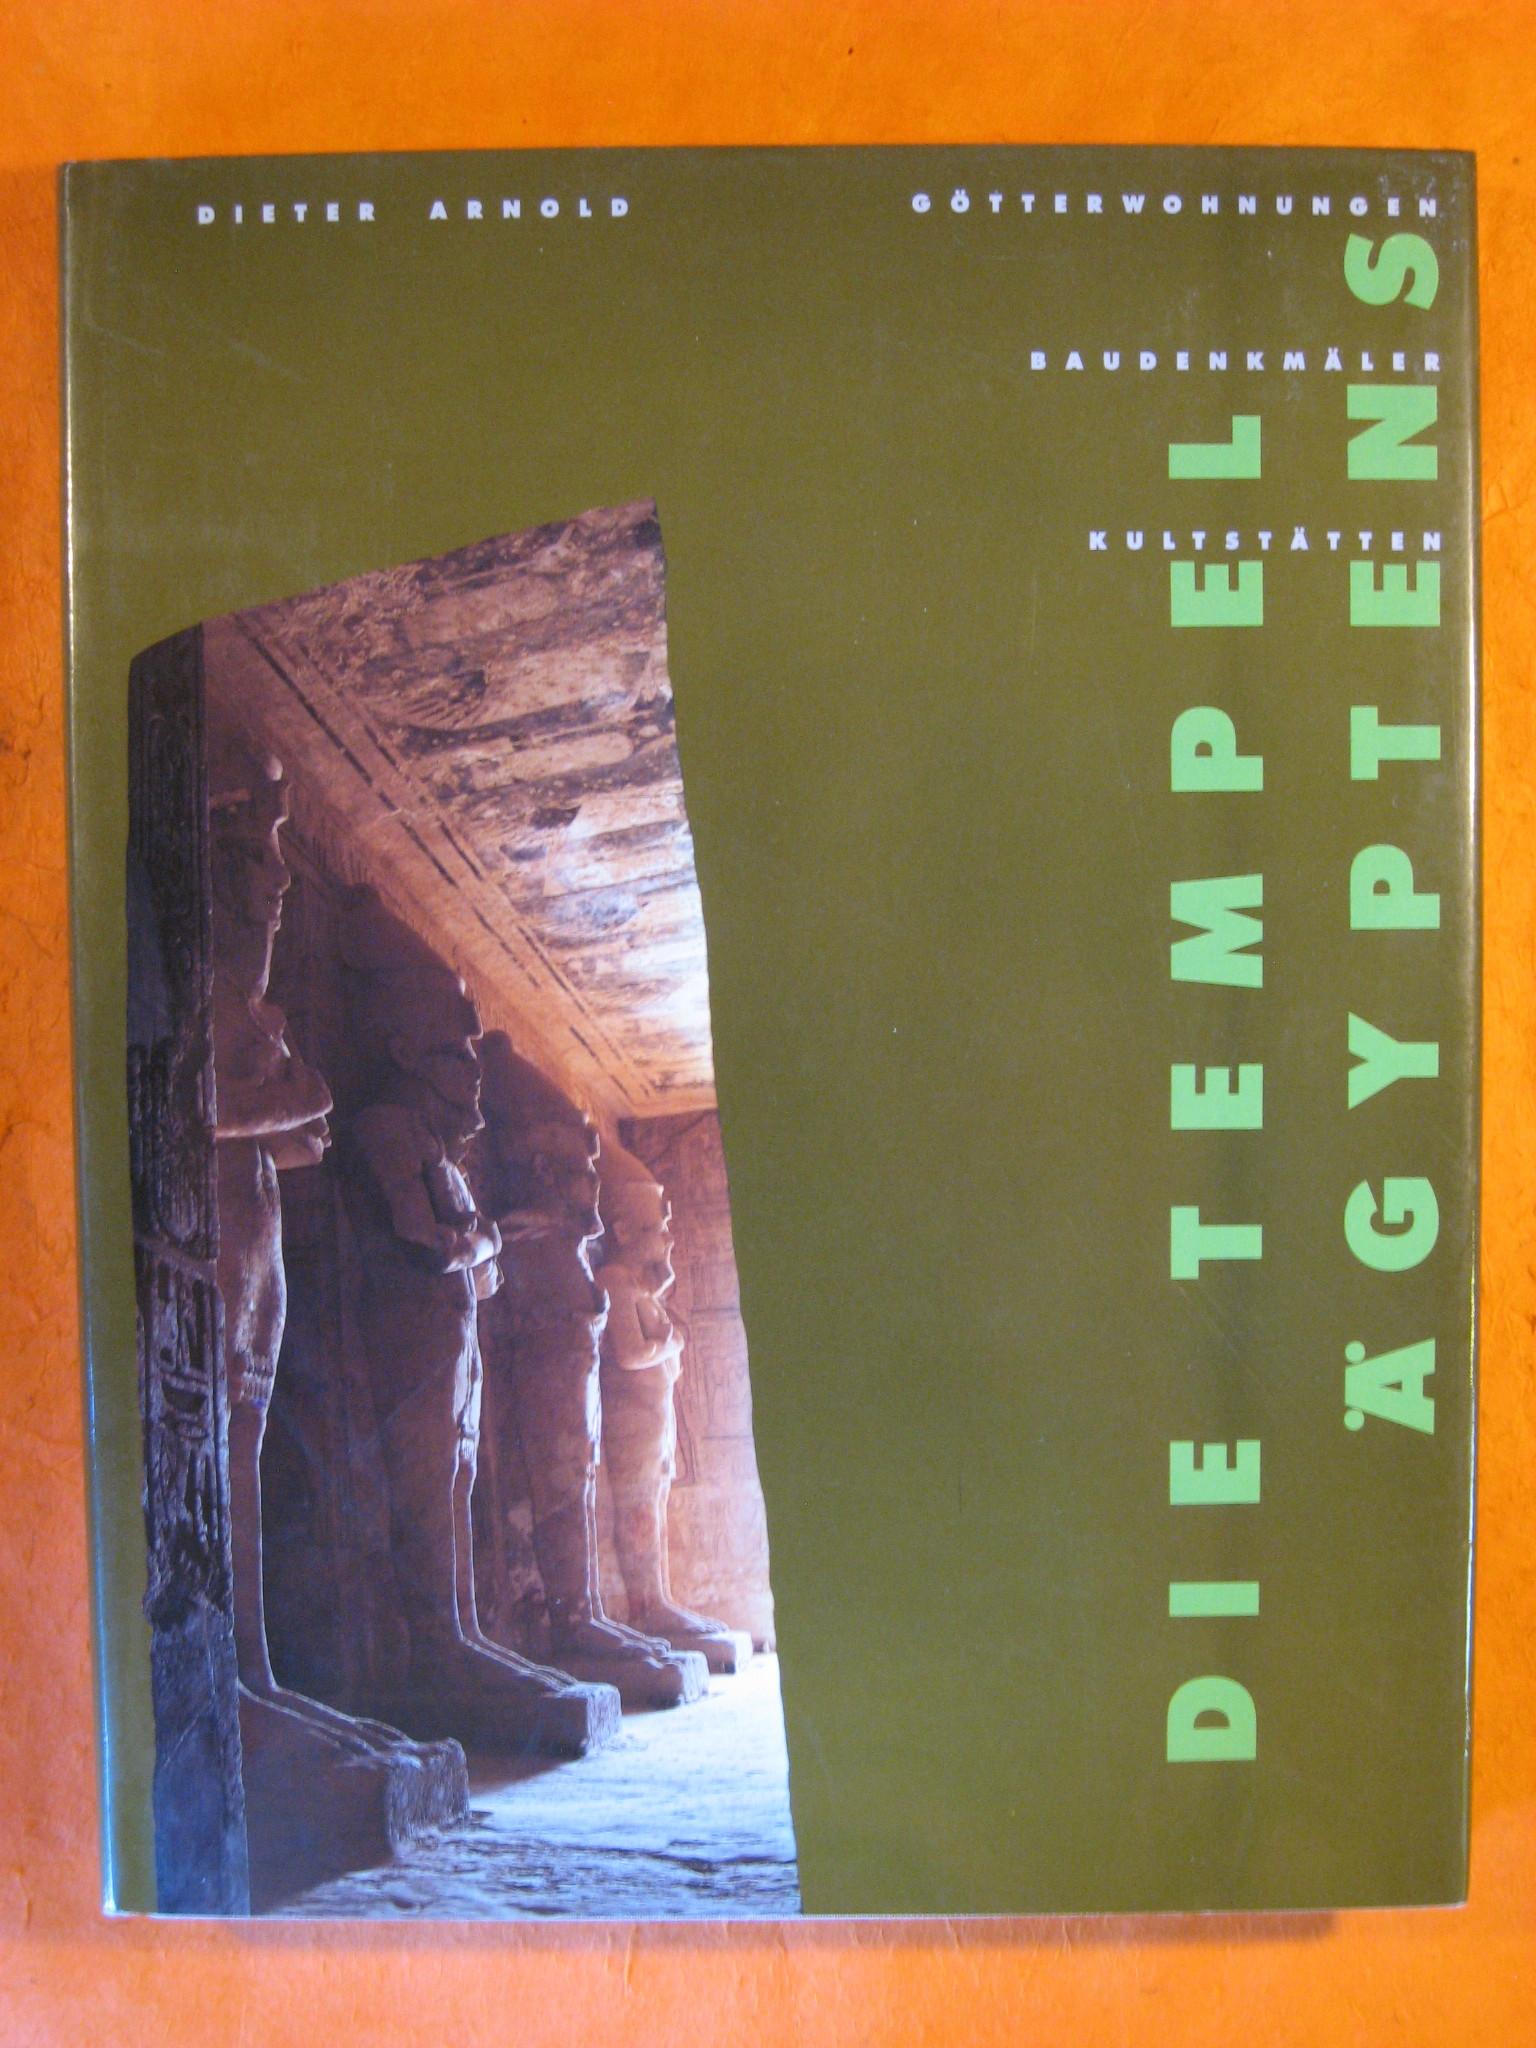 Die Tempel Ägyptens. Götterwohnungen, Kultstätten, Baudenkmäler.,, Arnold, Dieter